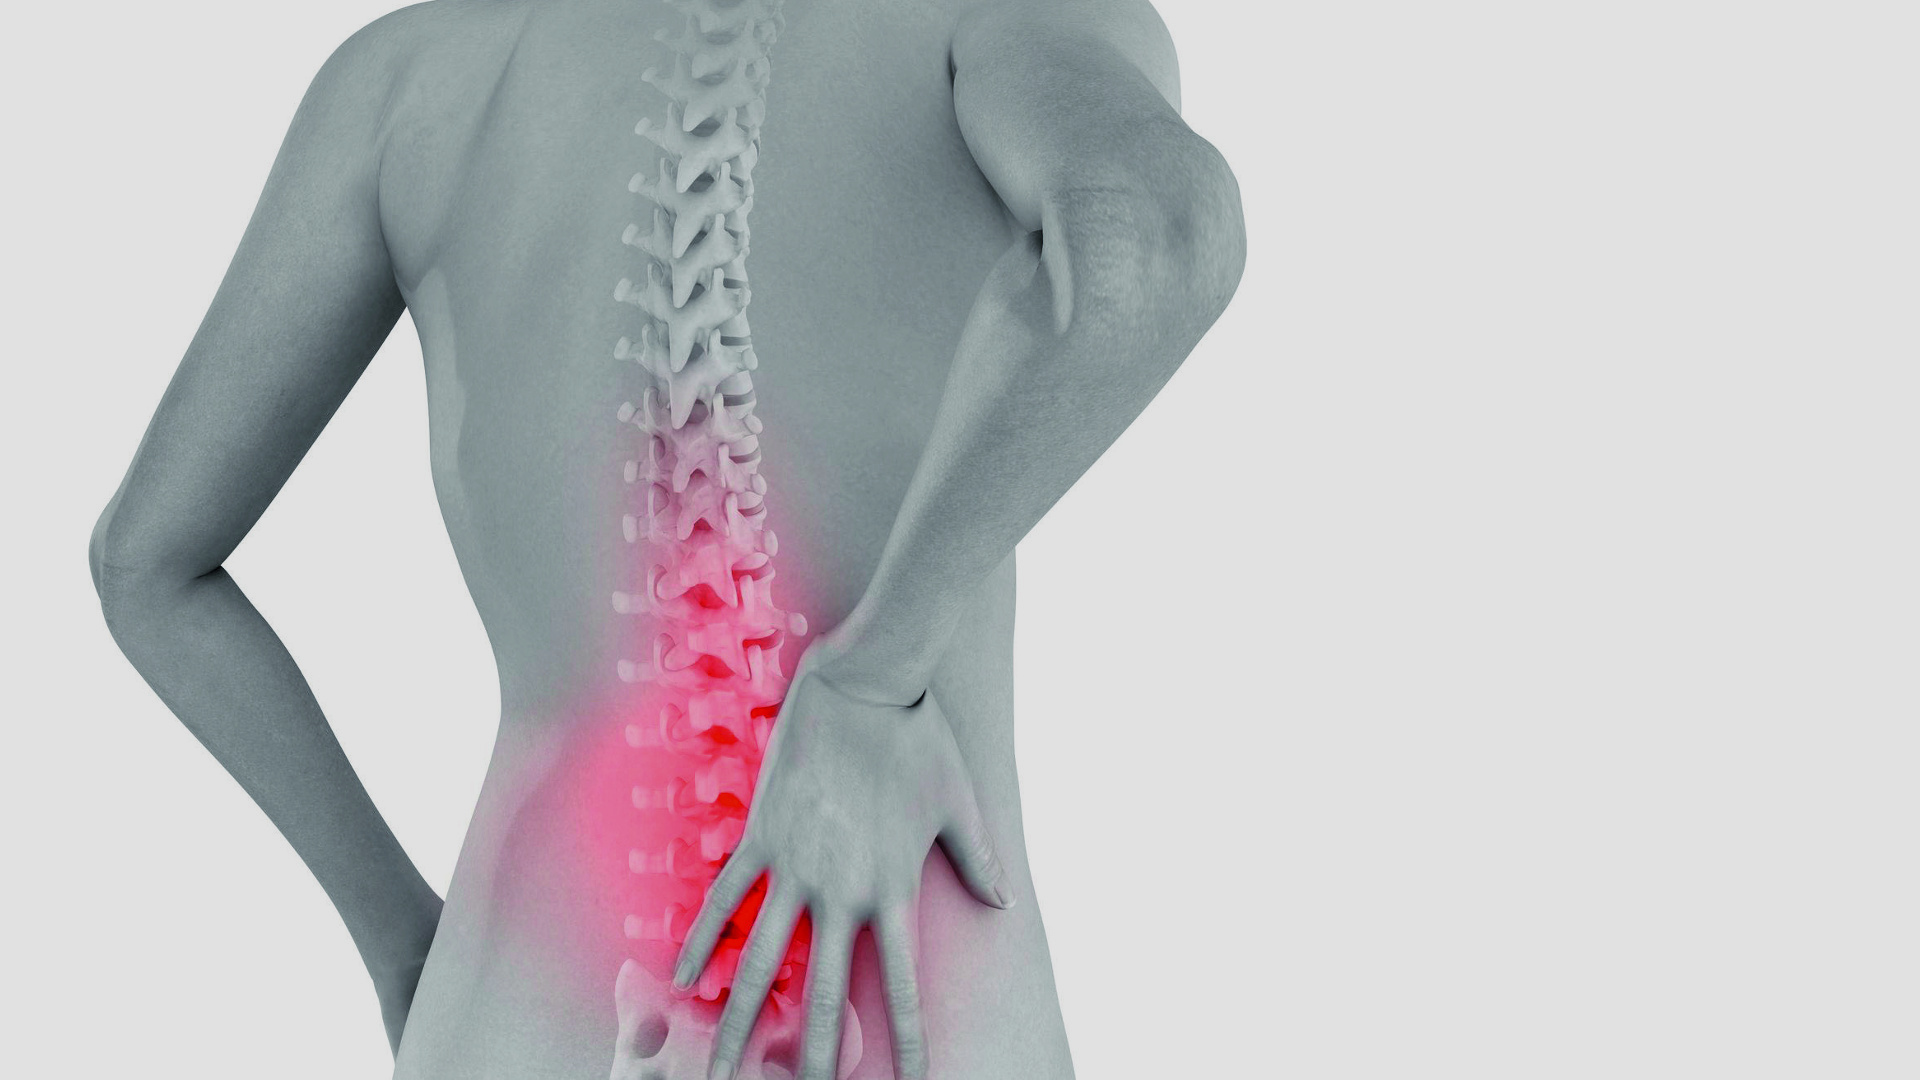 farmacia-controllo-osteoporosi